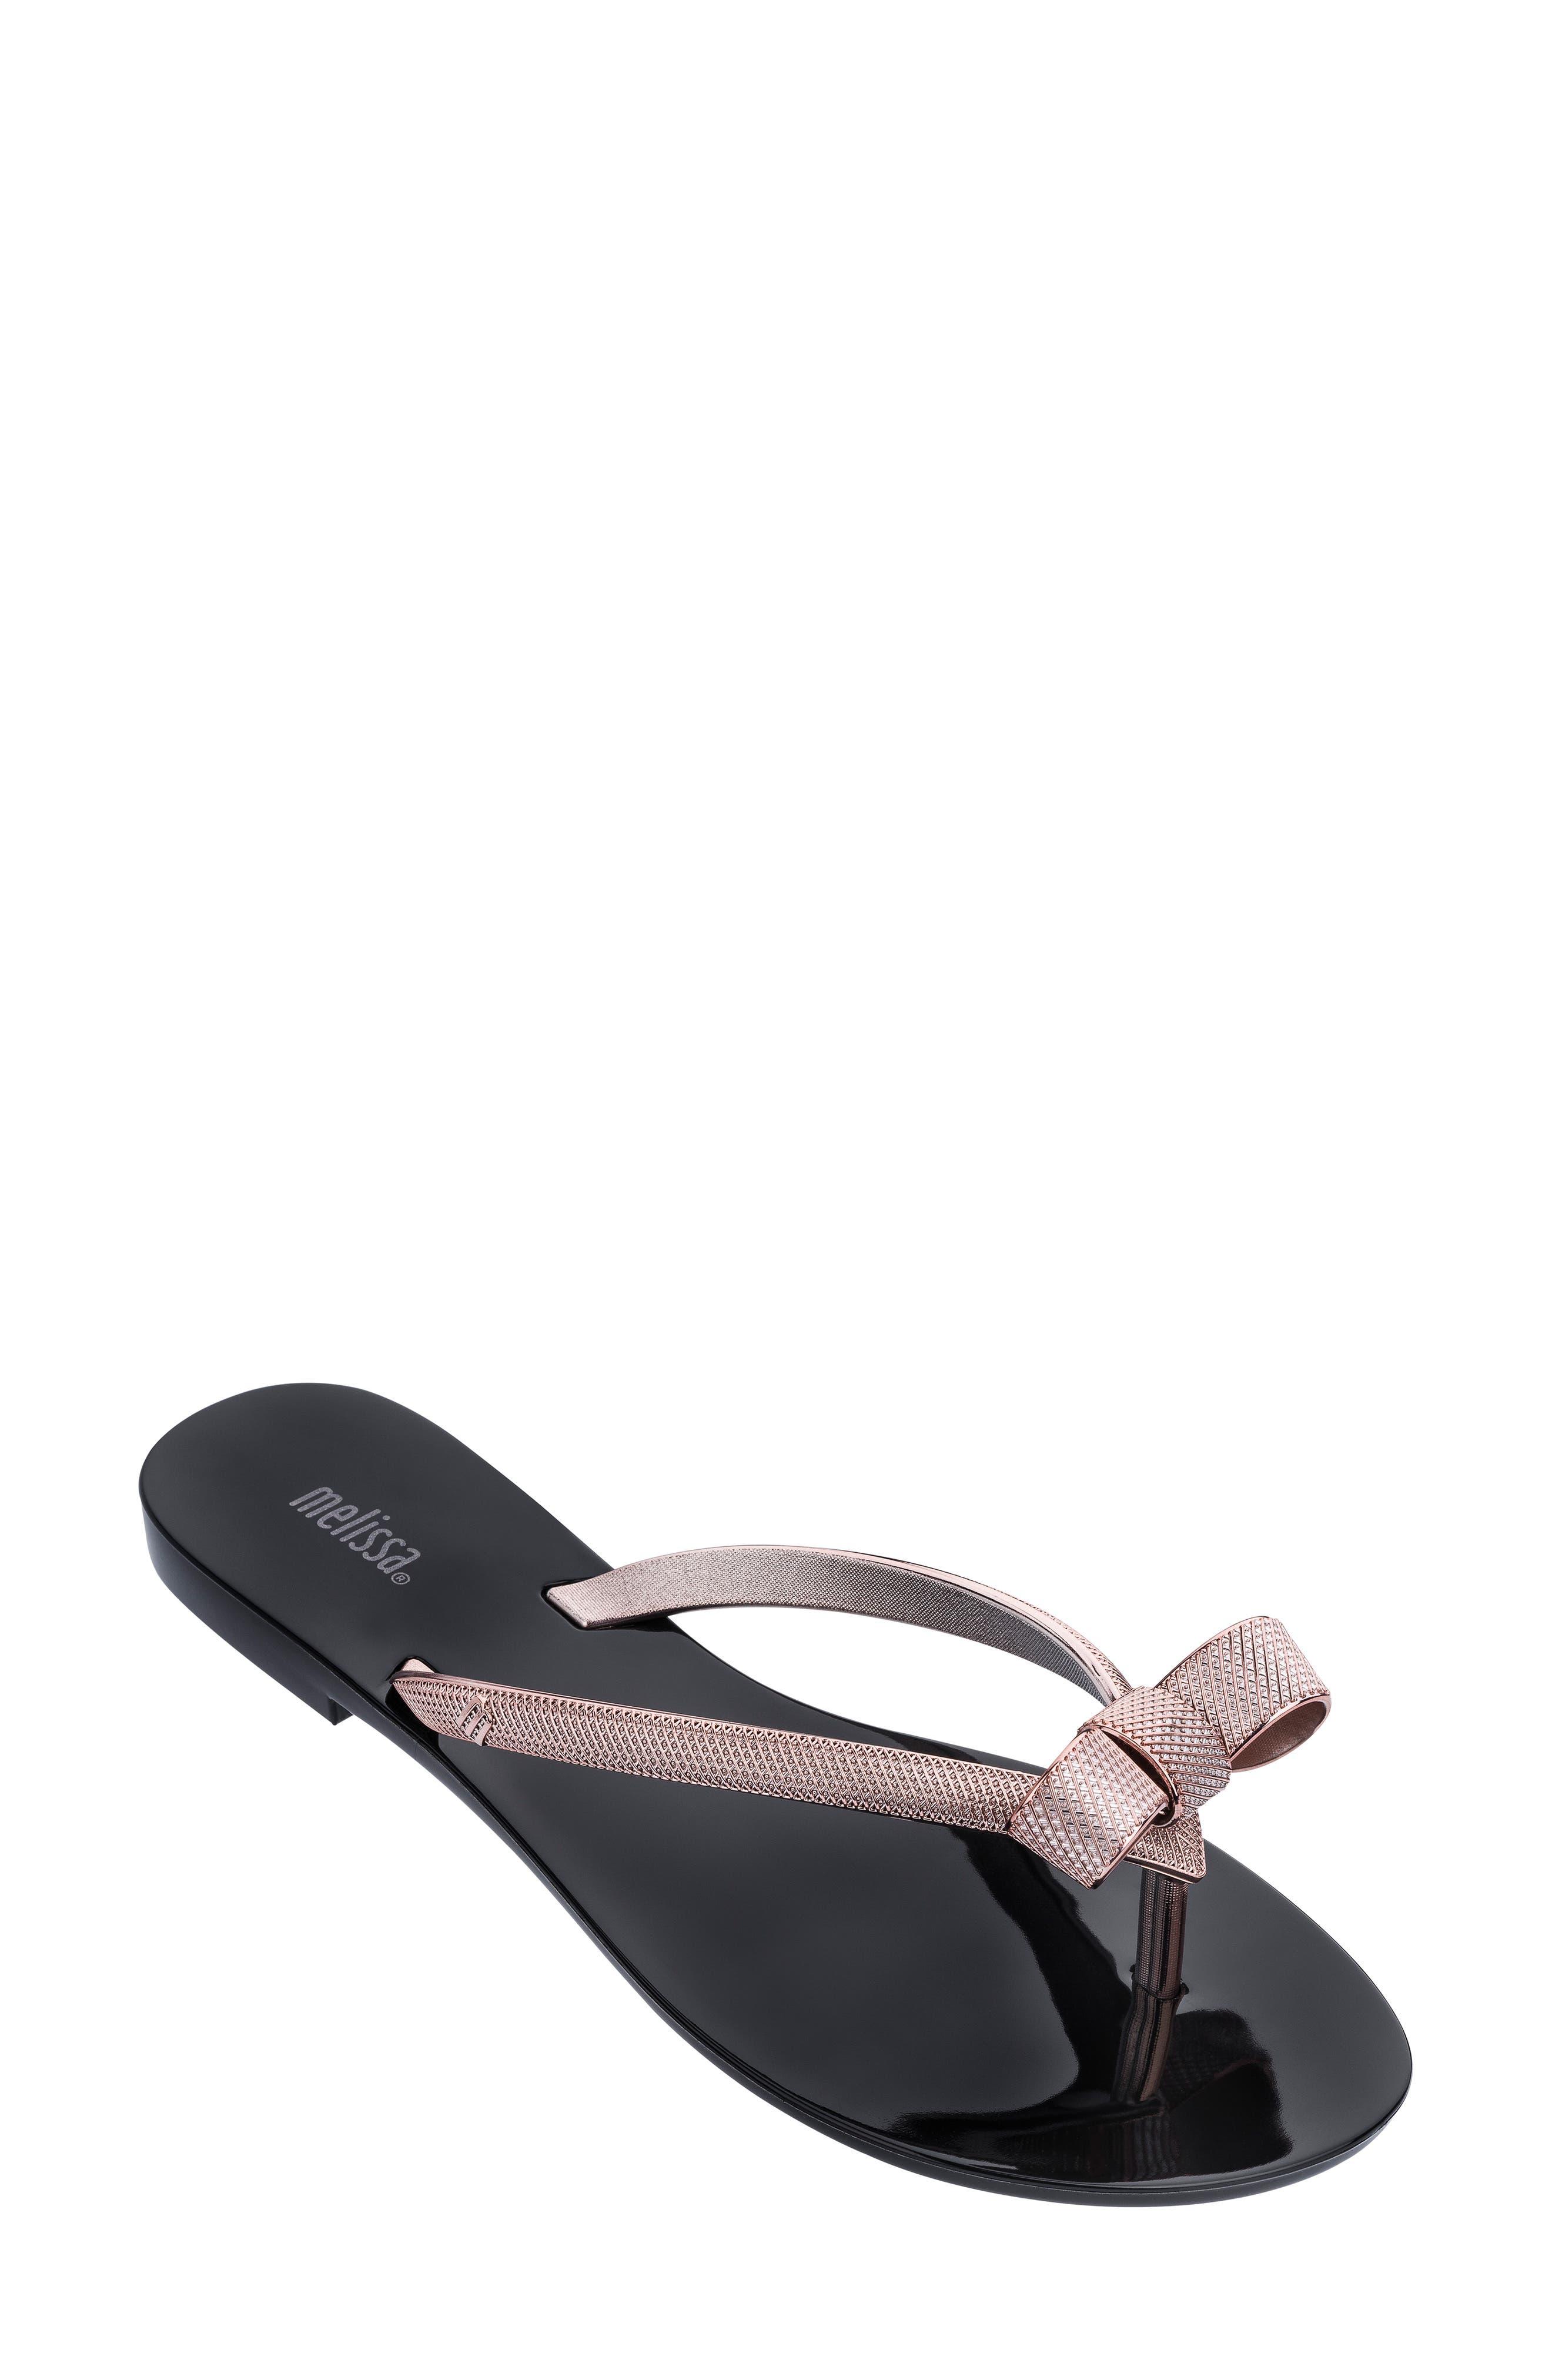 Melissa Harmonic Chrome Bow Flip Flop, Black